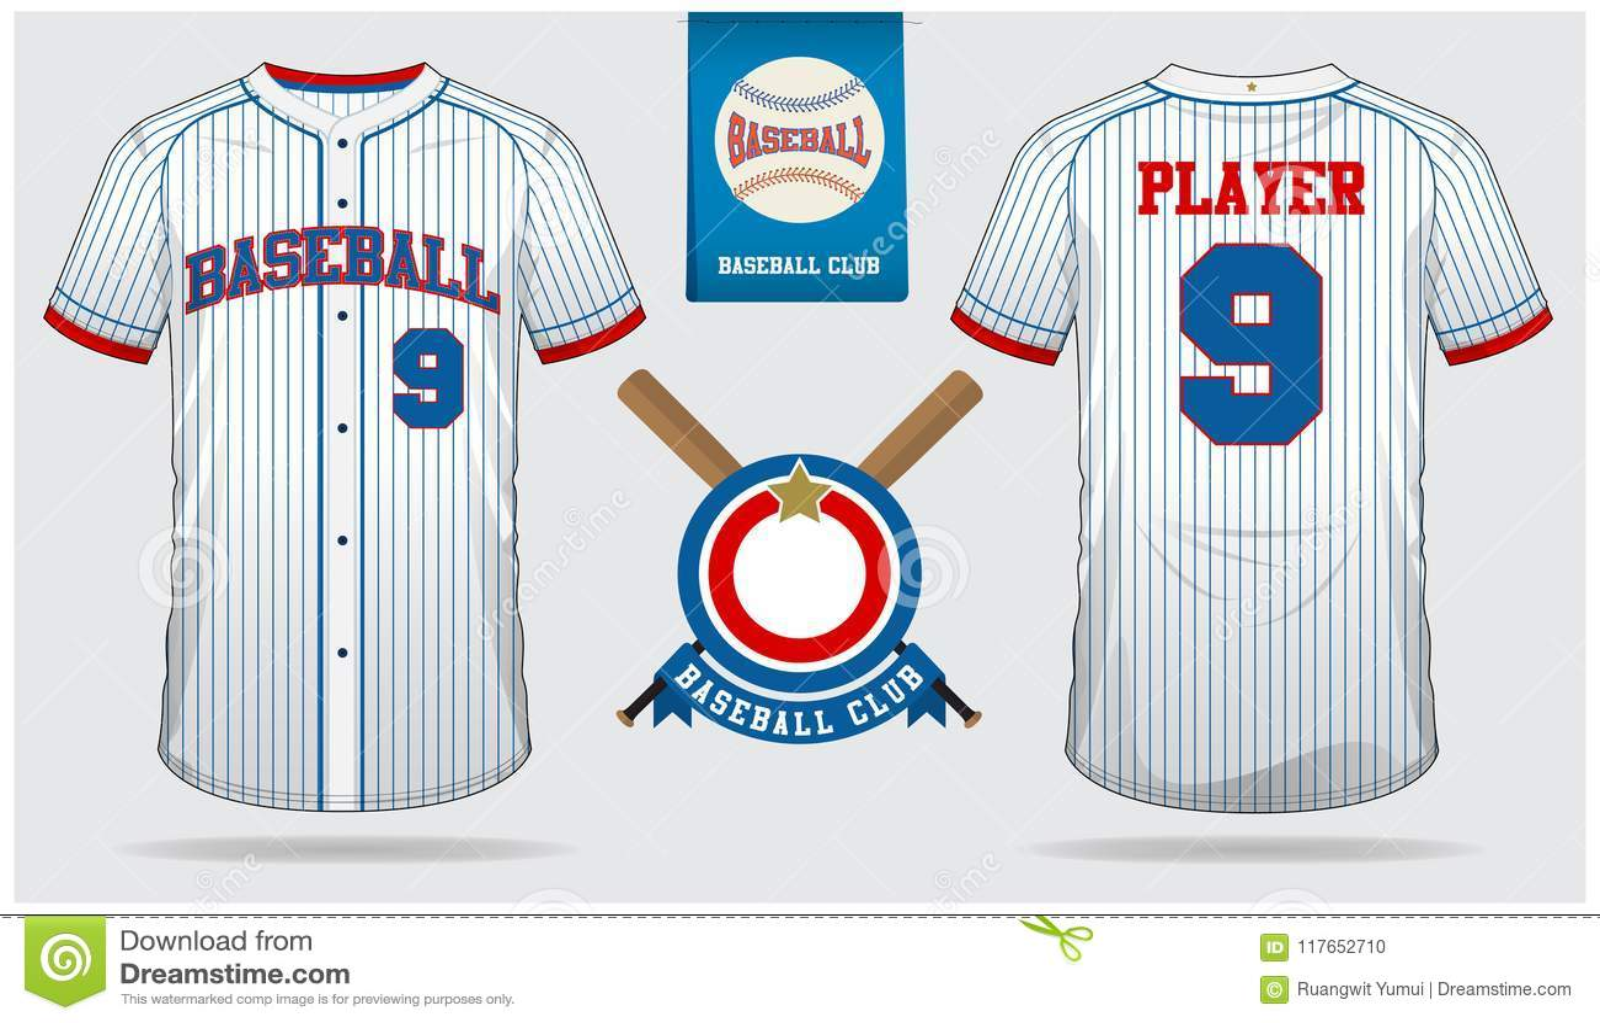 Jérsei de basebol, uniforme do esporte, esporte do t-shirt do raglan, curto, molde da peúga Zombaria do t-shirt do basebol acima